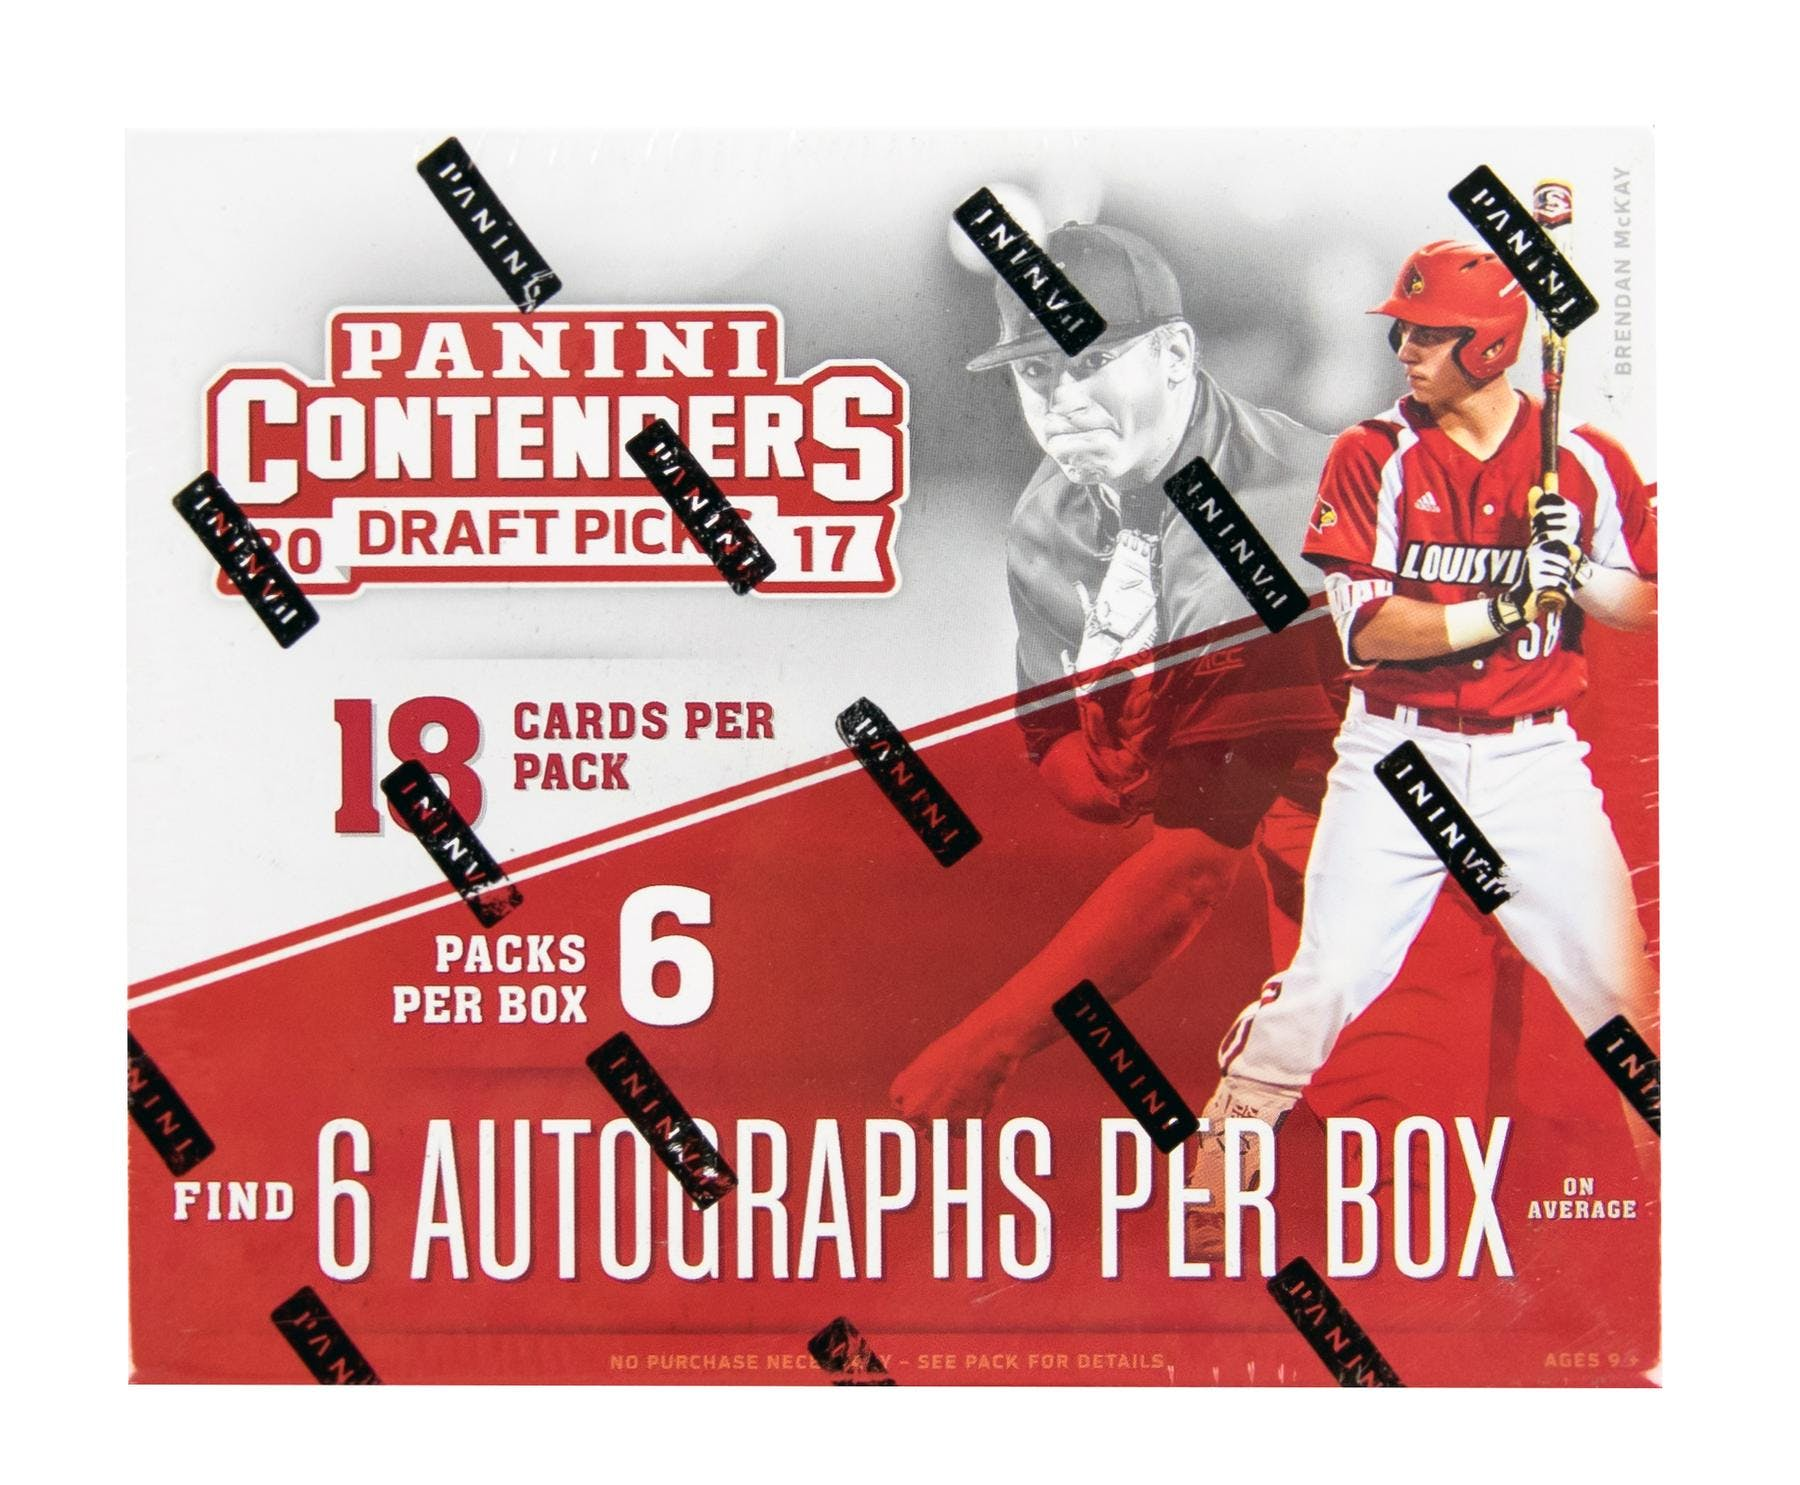 871ac88f1 2017 Panini Contenders Draft Picks Baseball Hobby Box